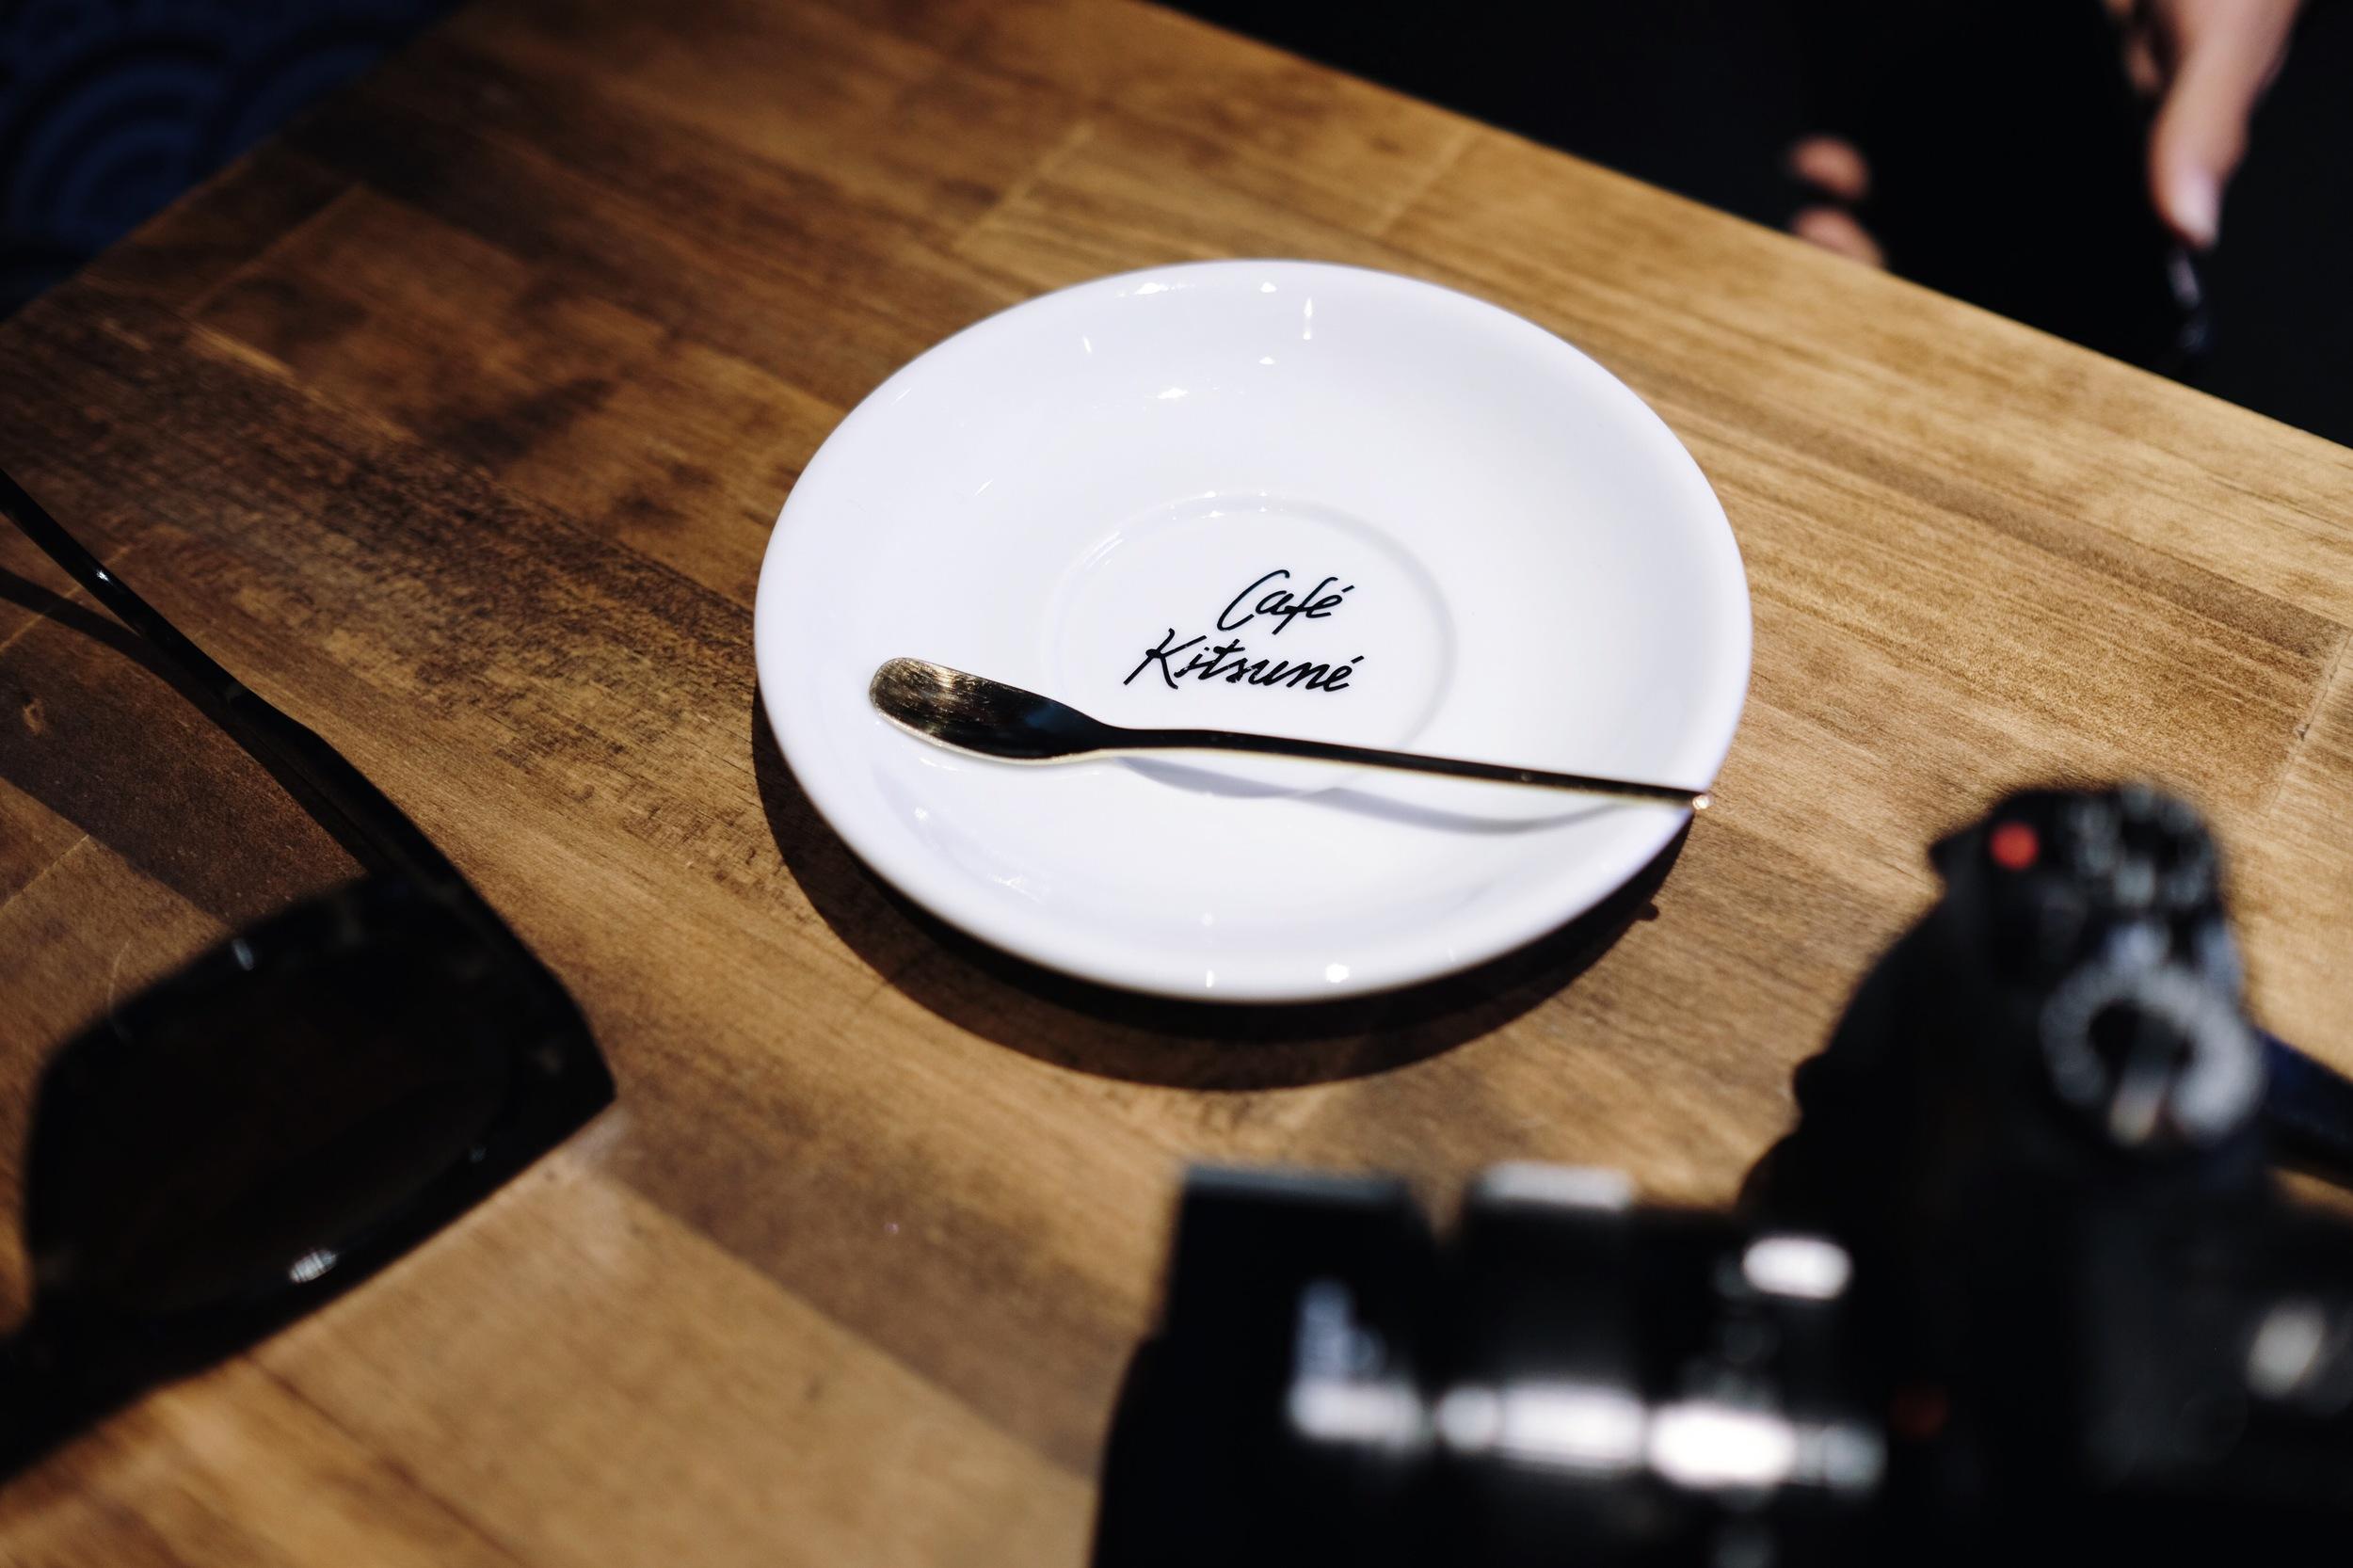 Café Kitsuné  in Aoyama